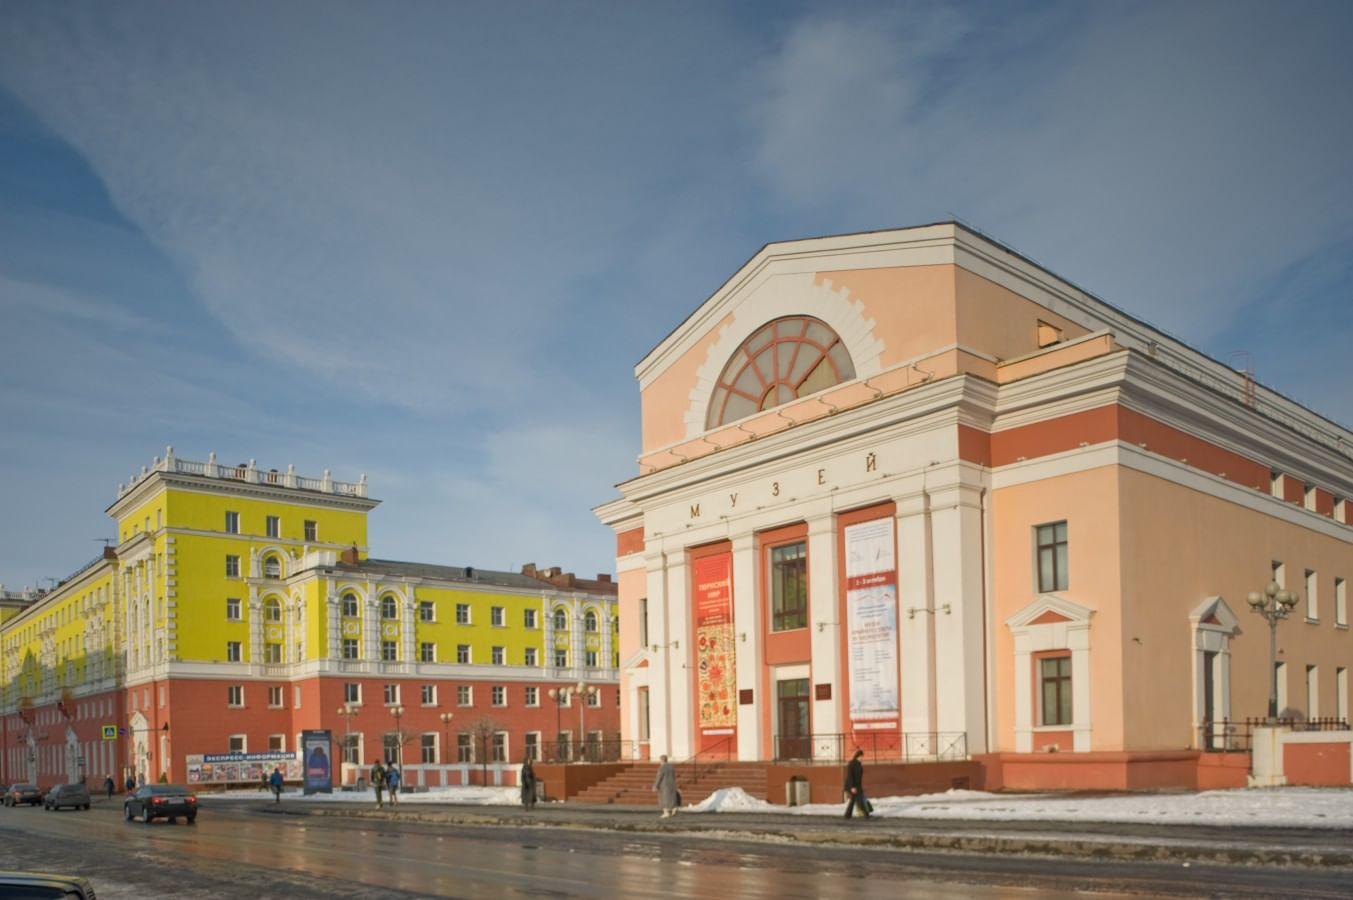 Норильск. Фото: Уильям Брумфилд